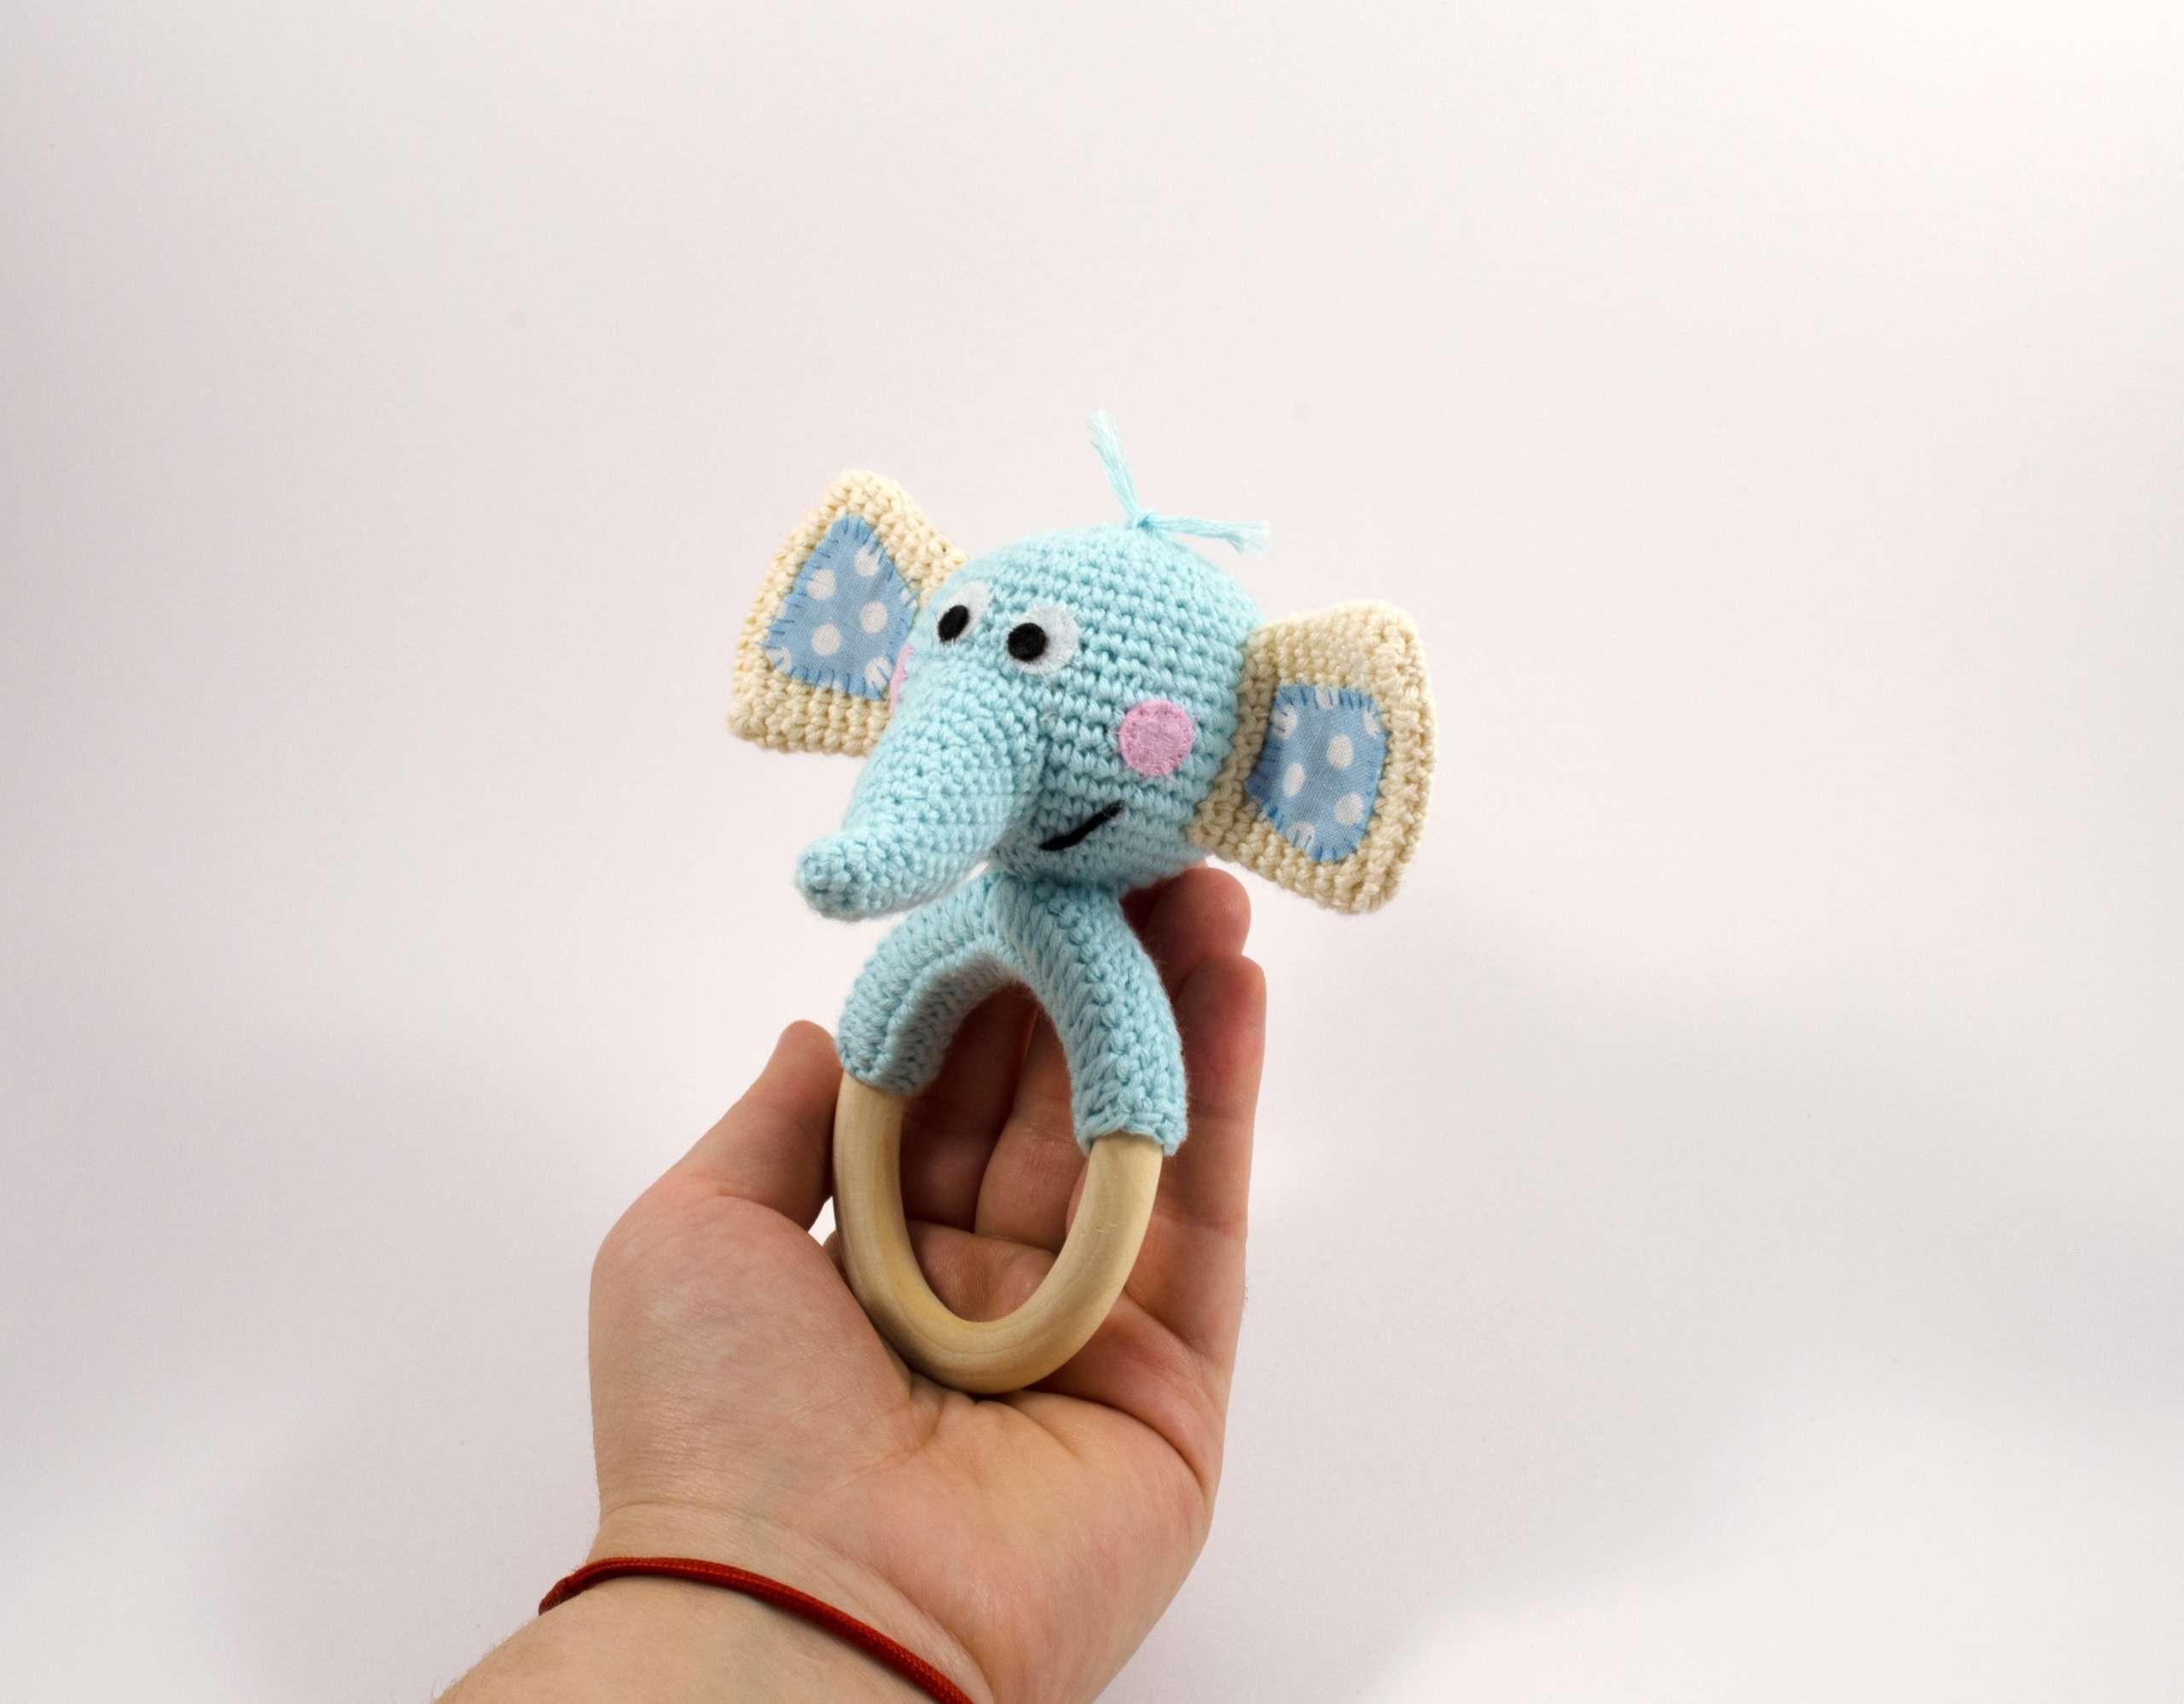 PATTERN: Siberian Husky Crochet Amigurumi Doll PDF Crochet | Etsy | 1498x1920